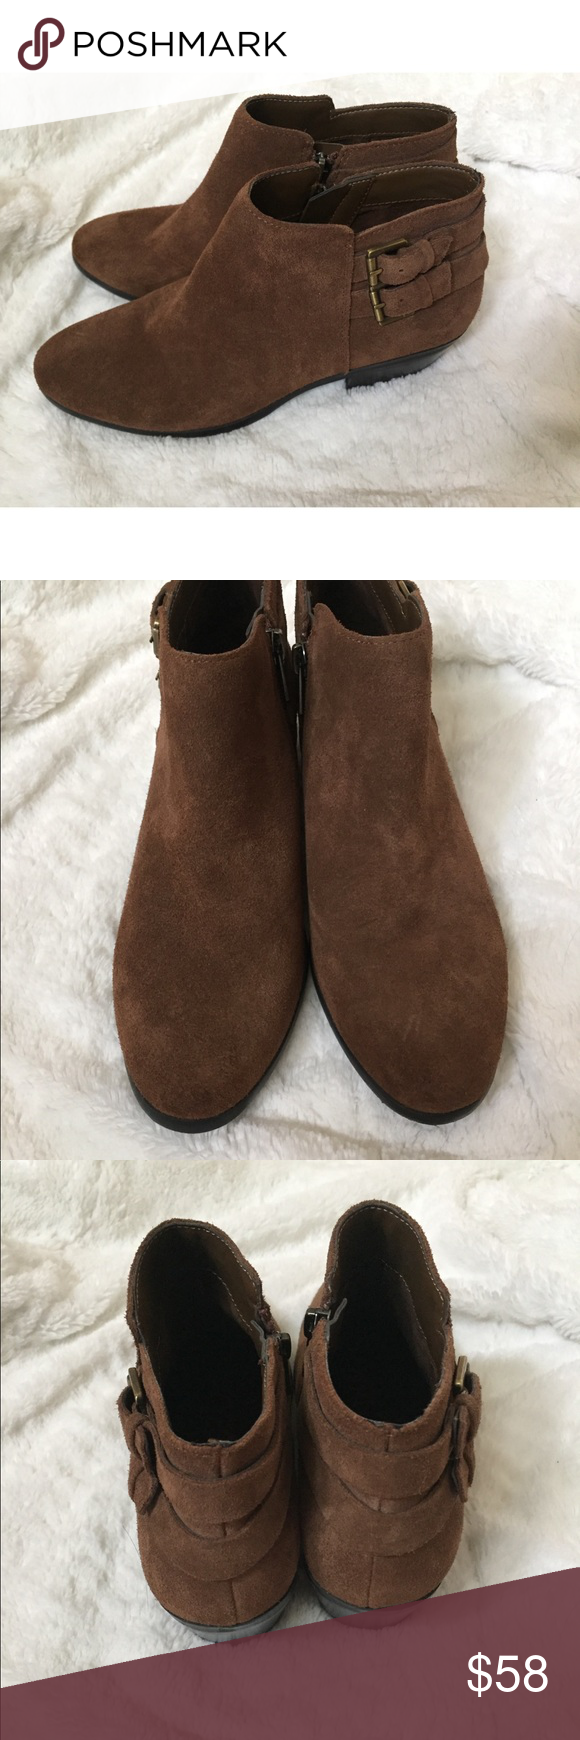 "853c203ddb02 Sam Edelman Suede Petal Bootie Adorable suede Sam Edelman boots in the  color ""Rough Out"